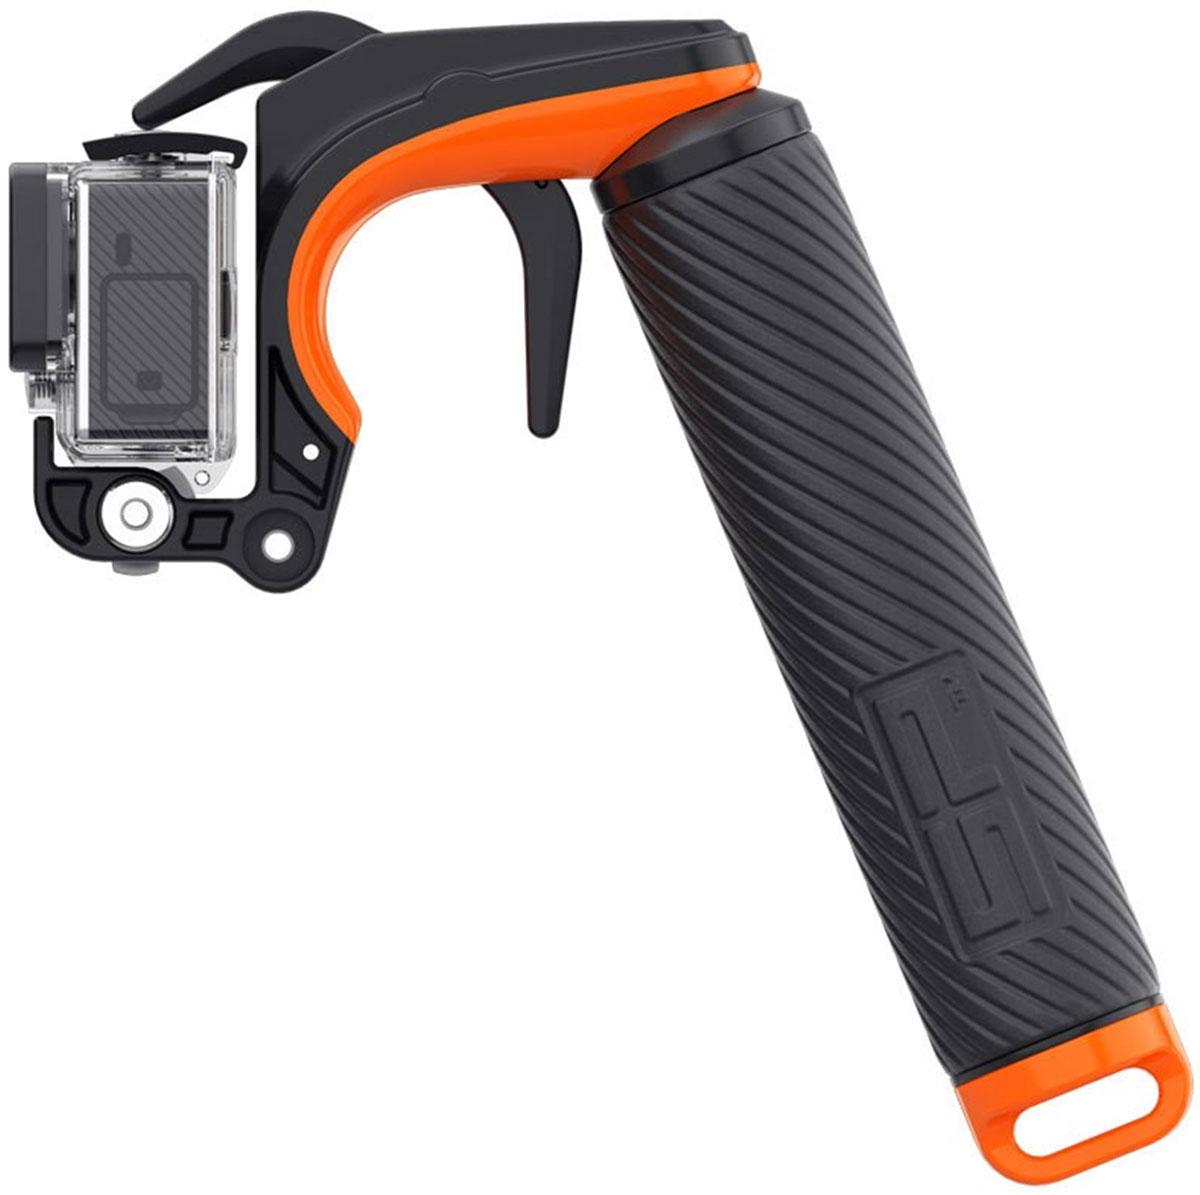 SP-Gadgets Pistol Trigger Grip Set, Black монопод для экшн-камеры 53114